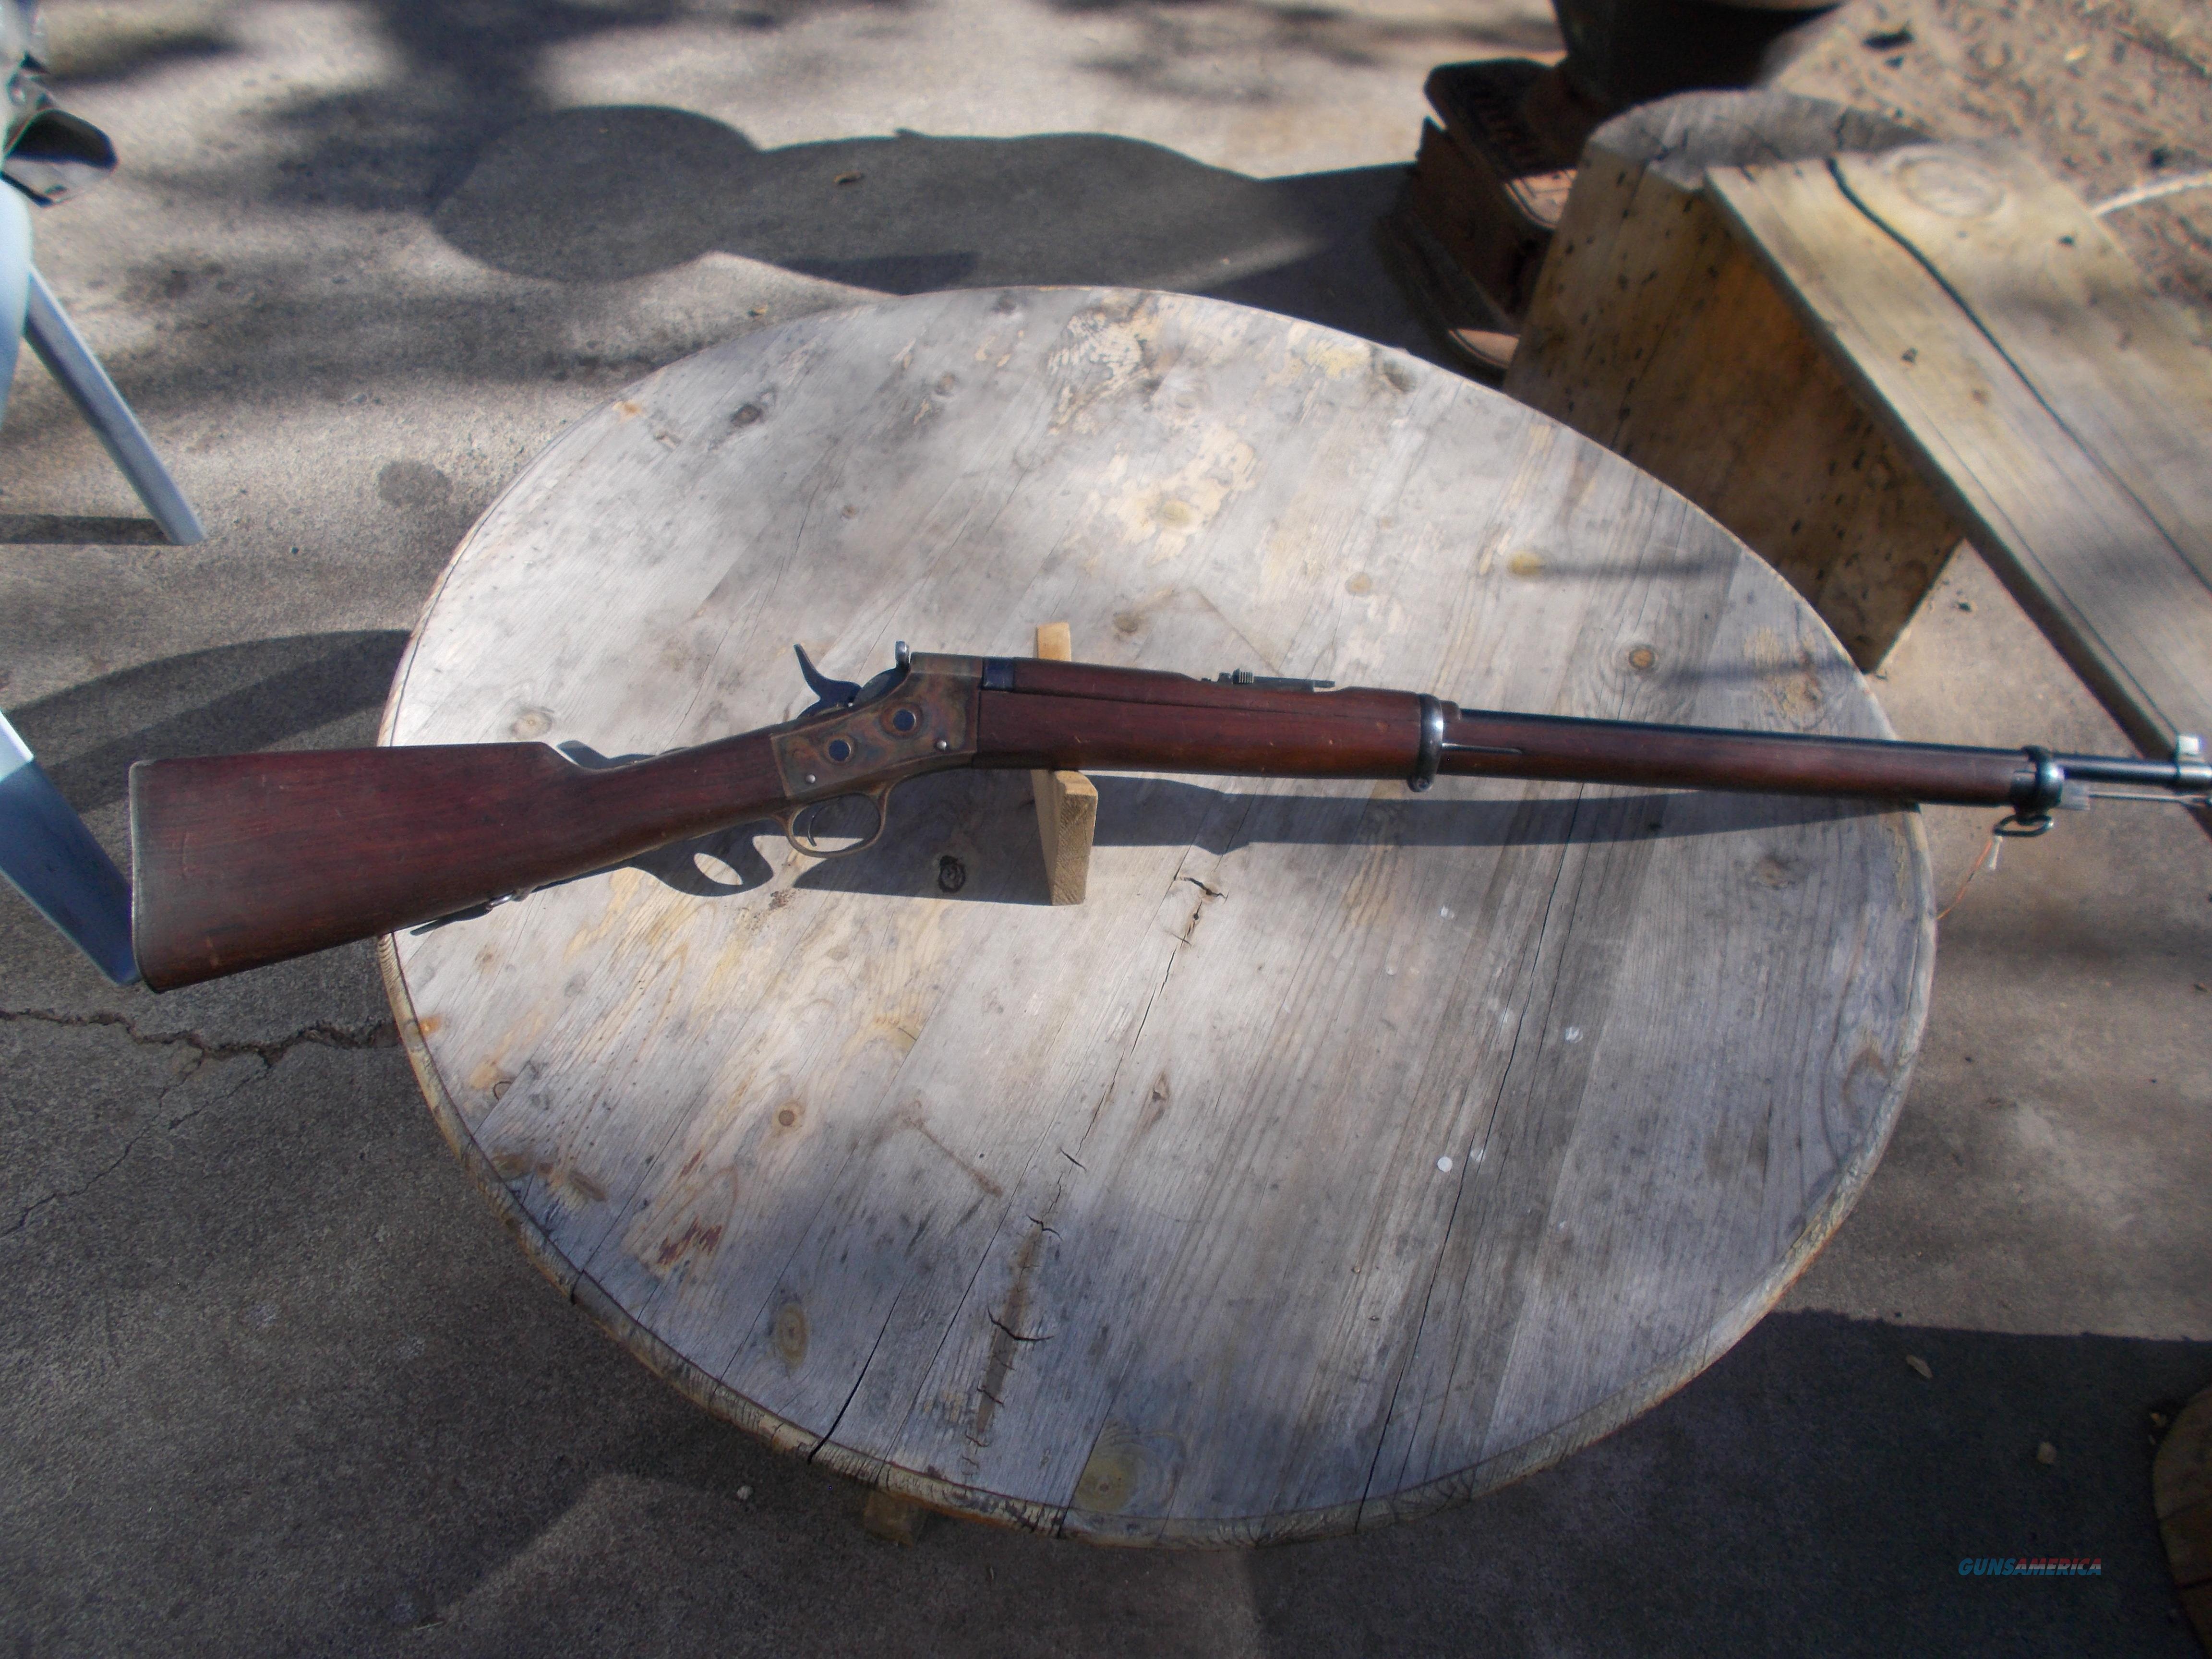 1901 remington rolling block 7mm  Guns > Rifles > Remington Rifles - Modern > Other